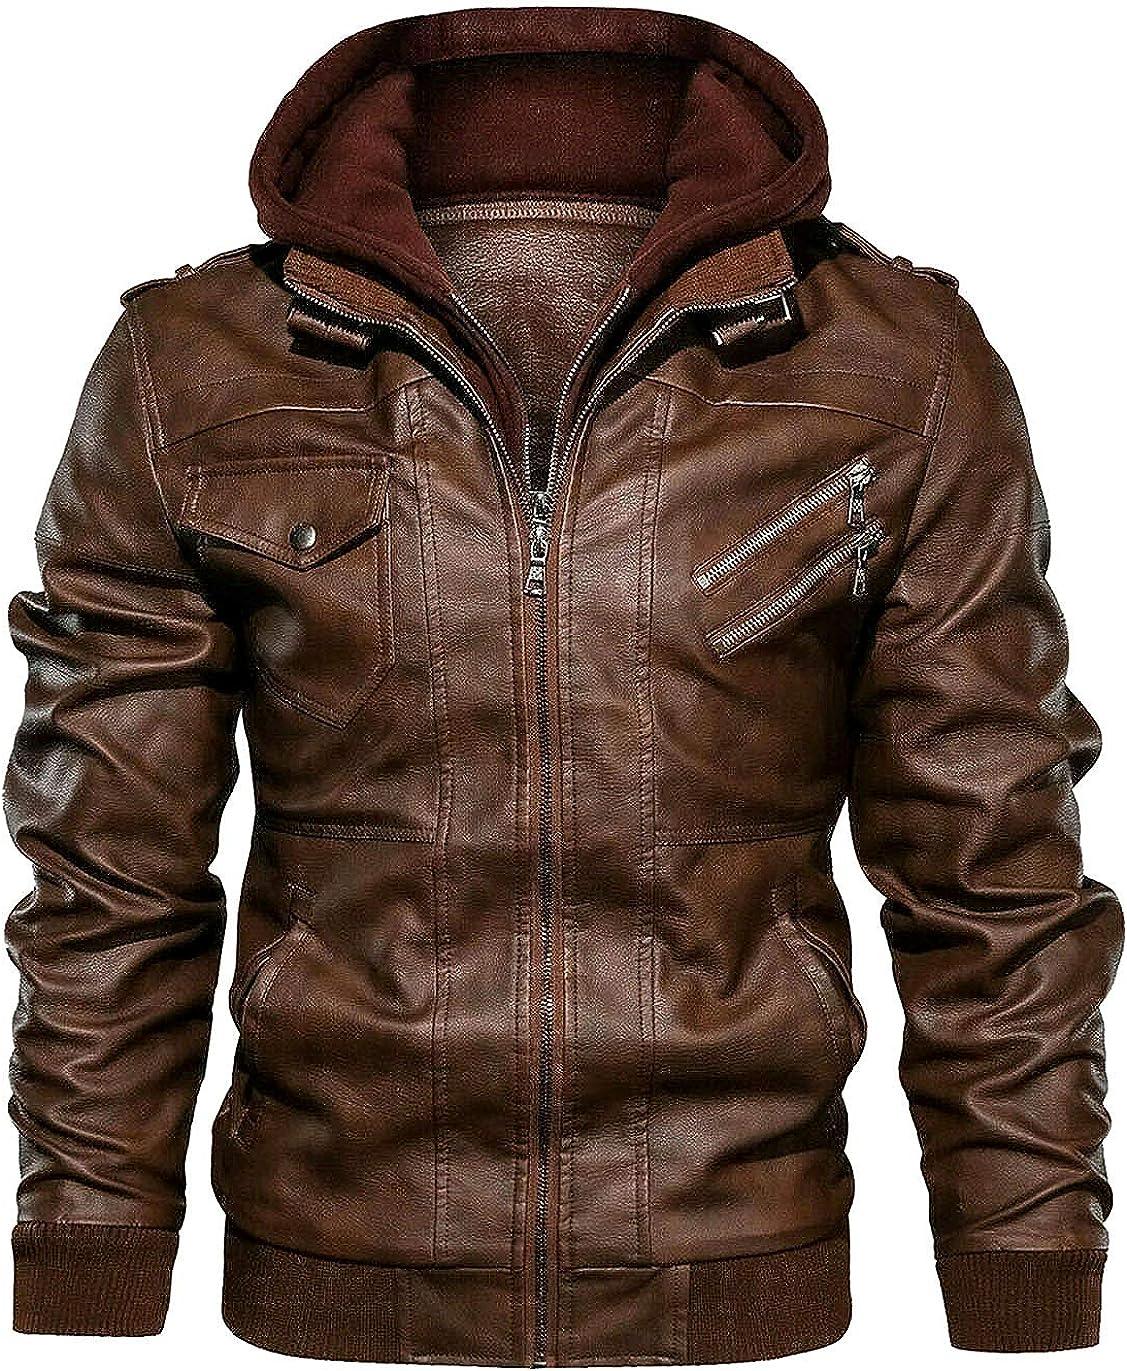 chamarras de Hombre de invierno - Men's Leather Motorcycle Jacket with Removable Hood Brown